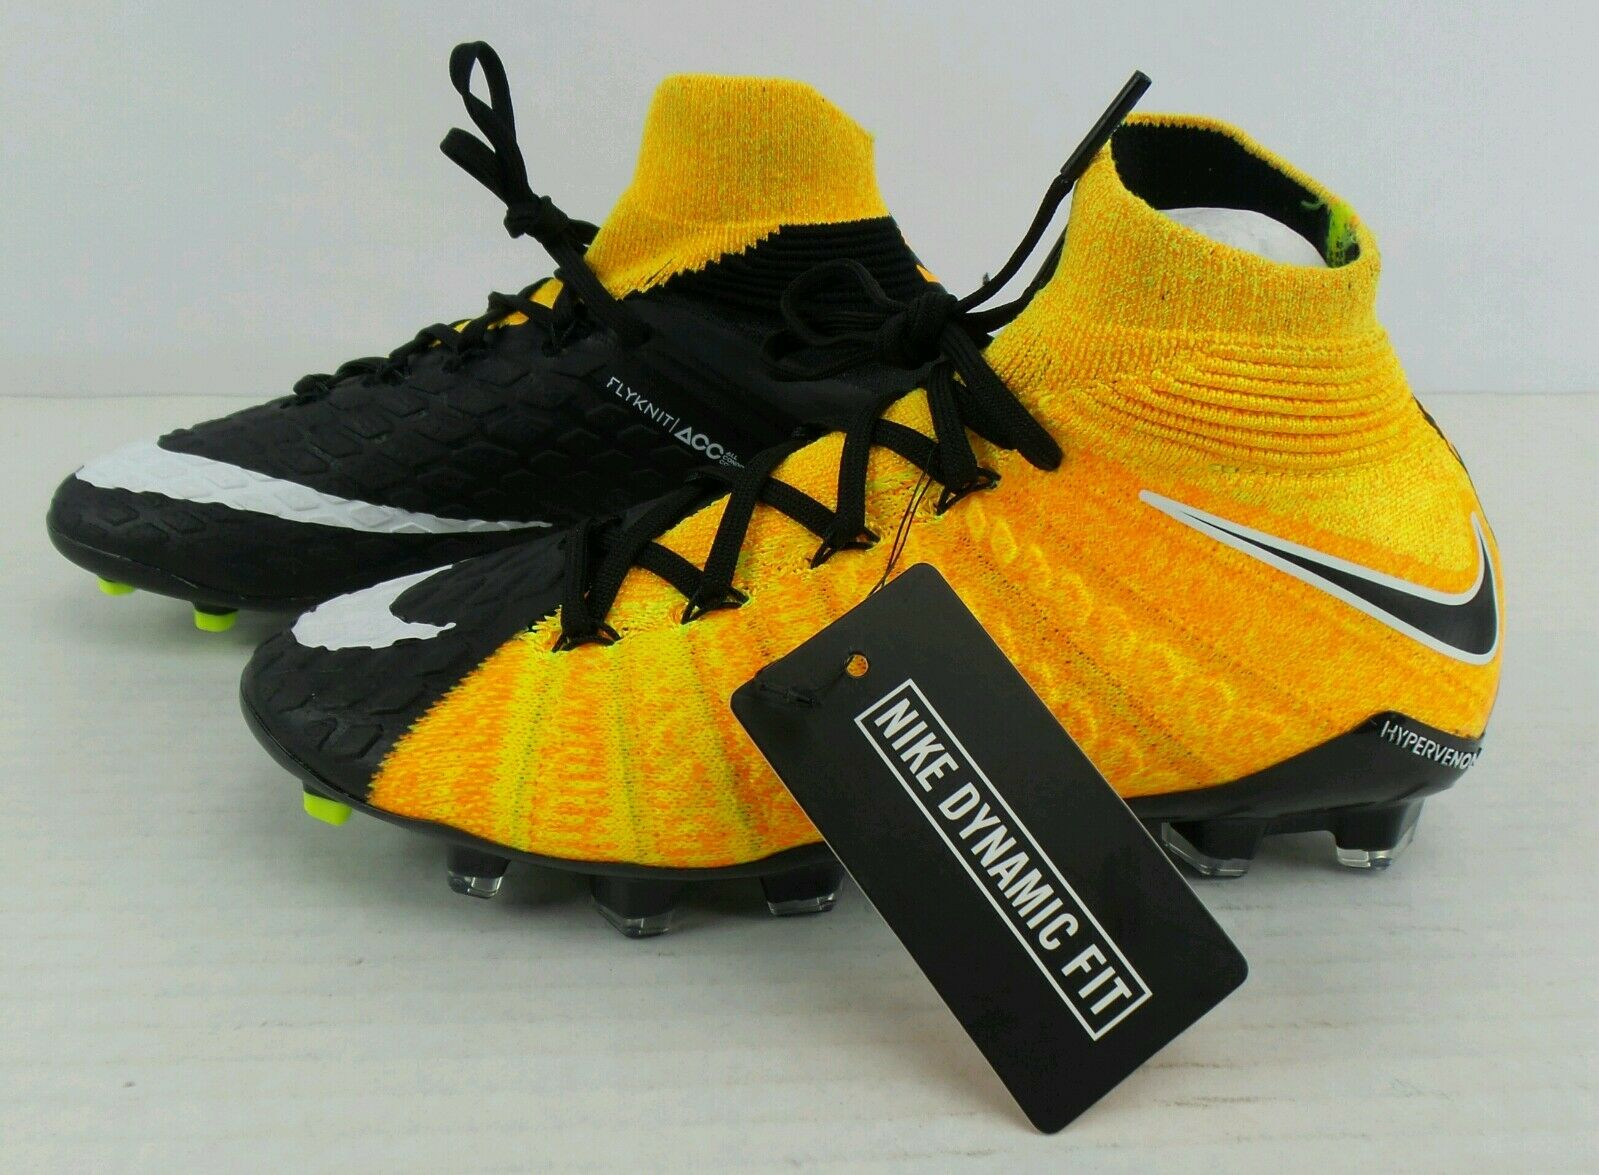 Nuevo Nike Hypervenom Fantasma III DF FG FLYKNIT Acc botín de fútbol Juventud de tamaño 4